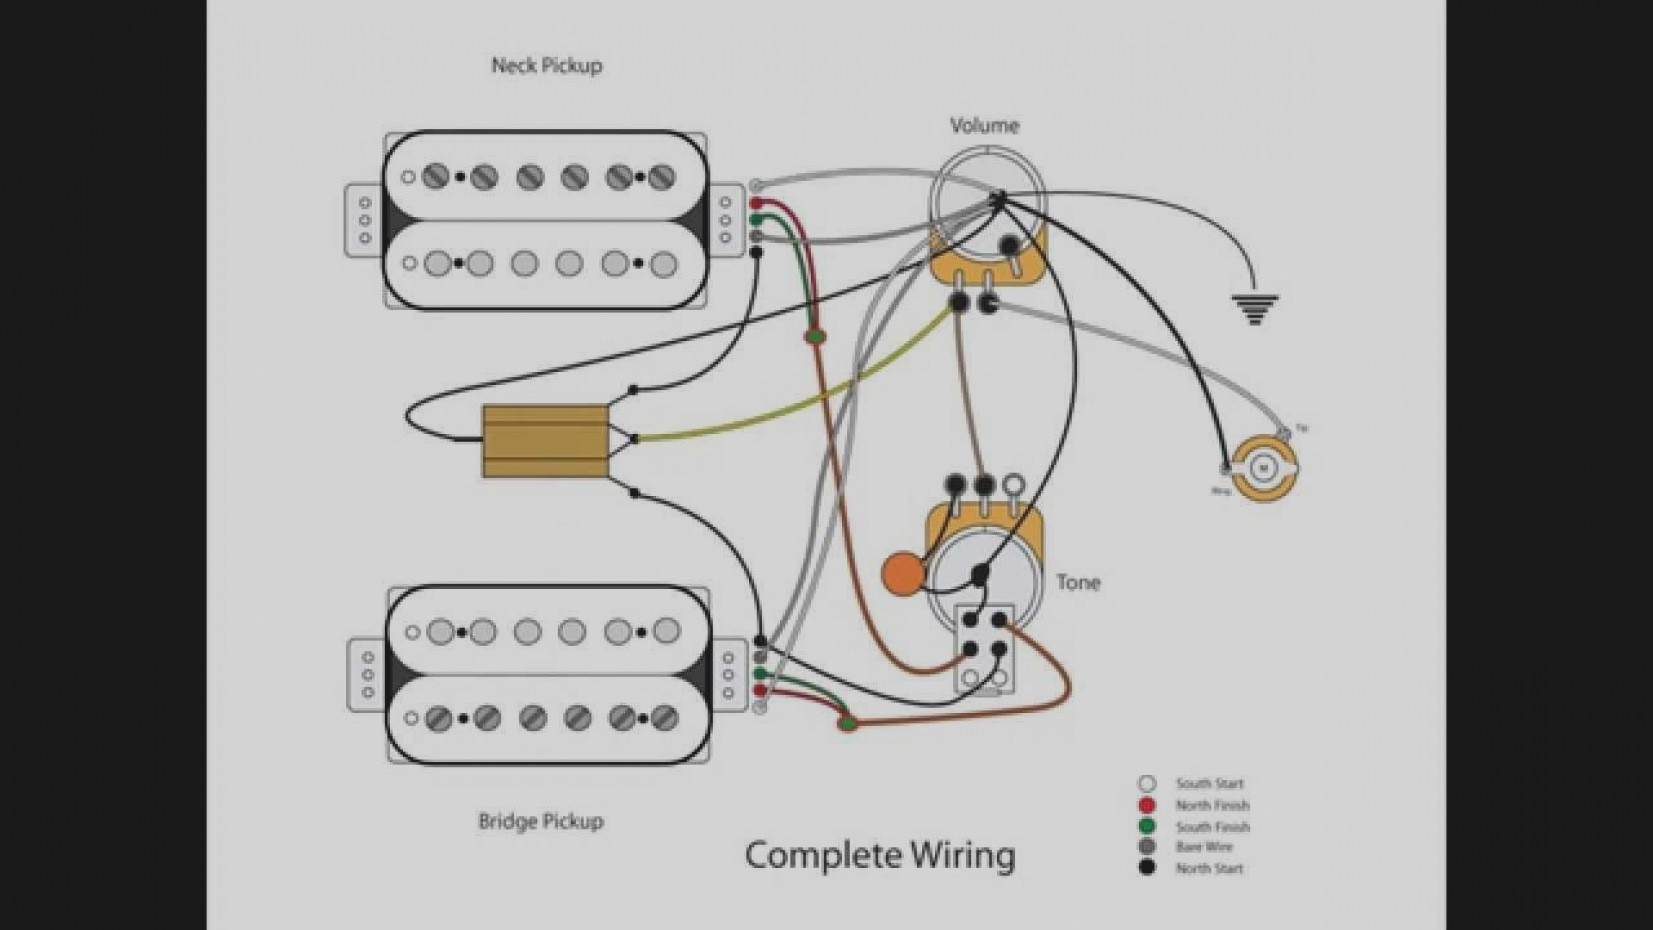 gfs dream 180 wiring diagram six sigma tree pickups 90 gibson pickup